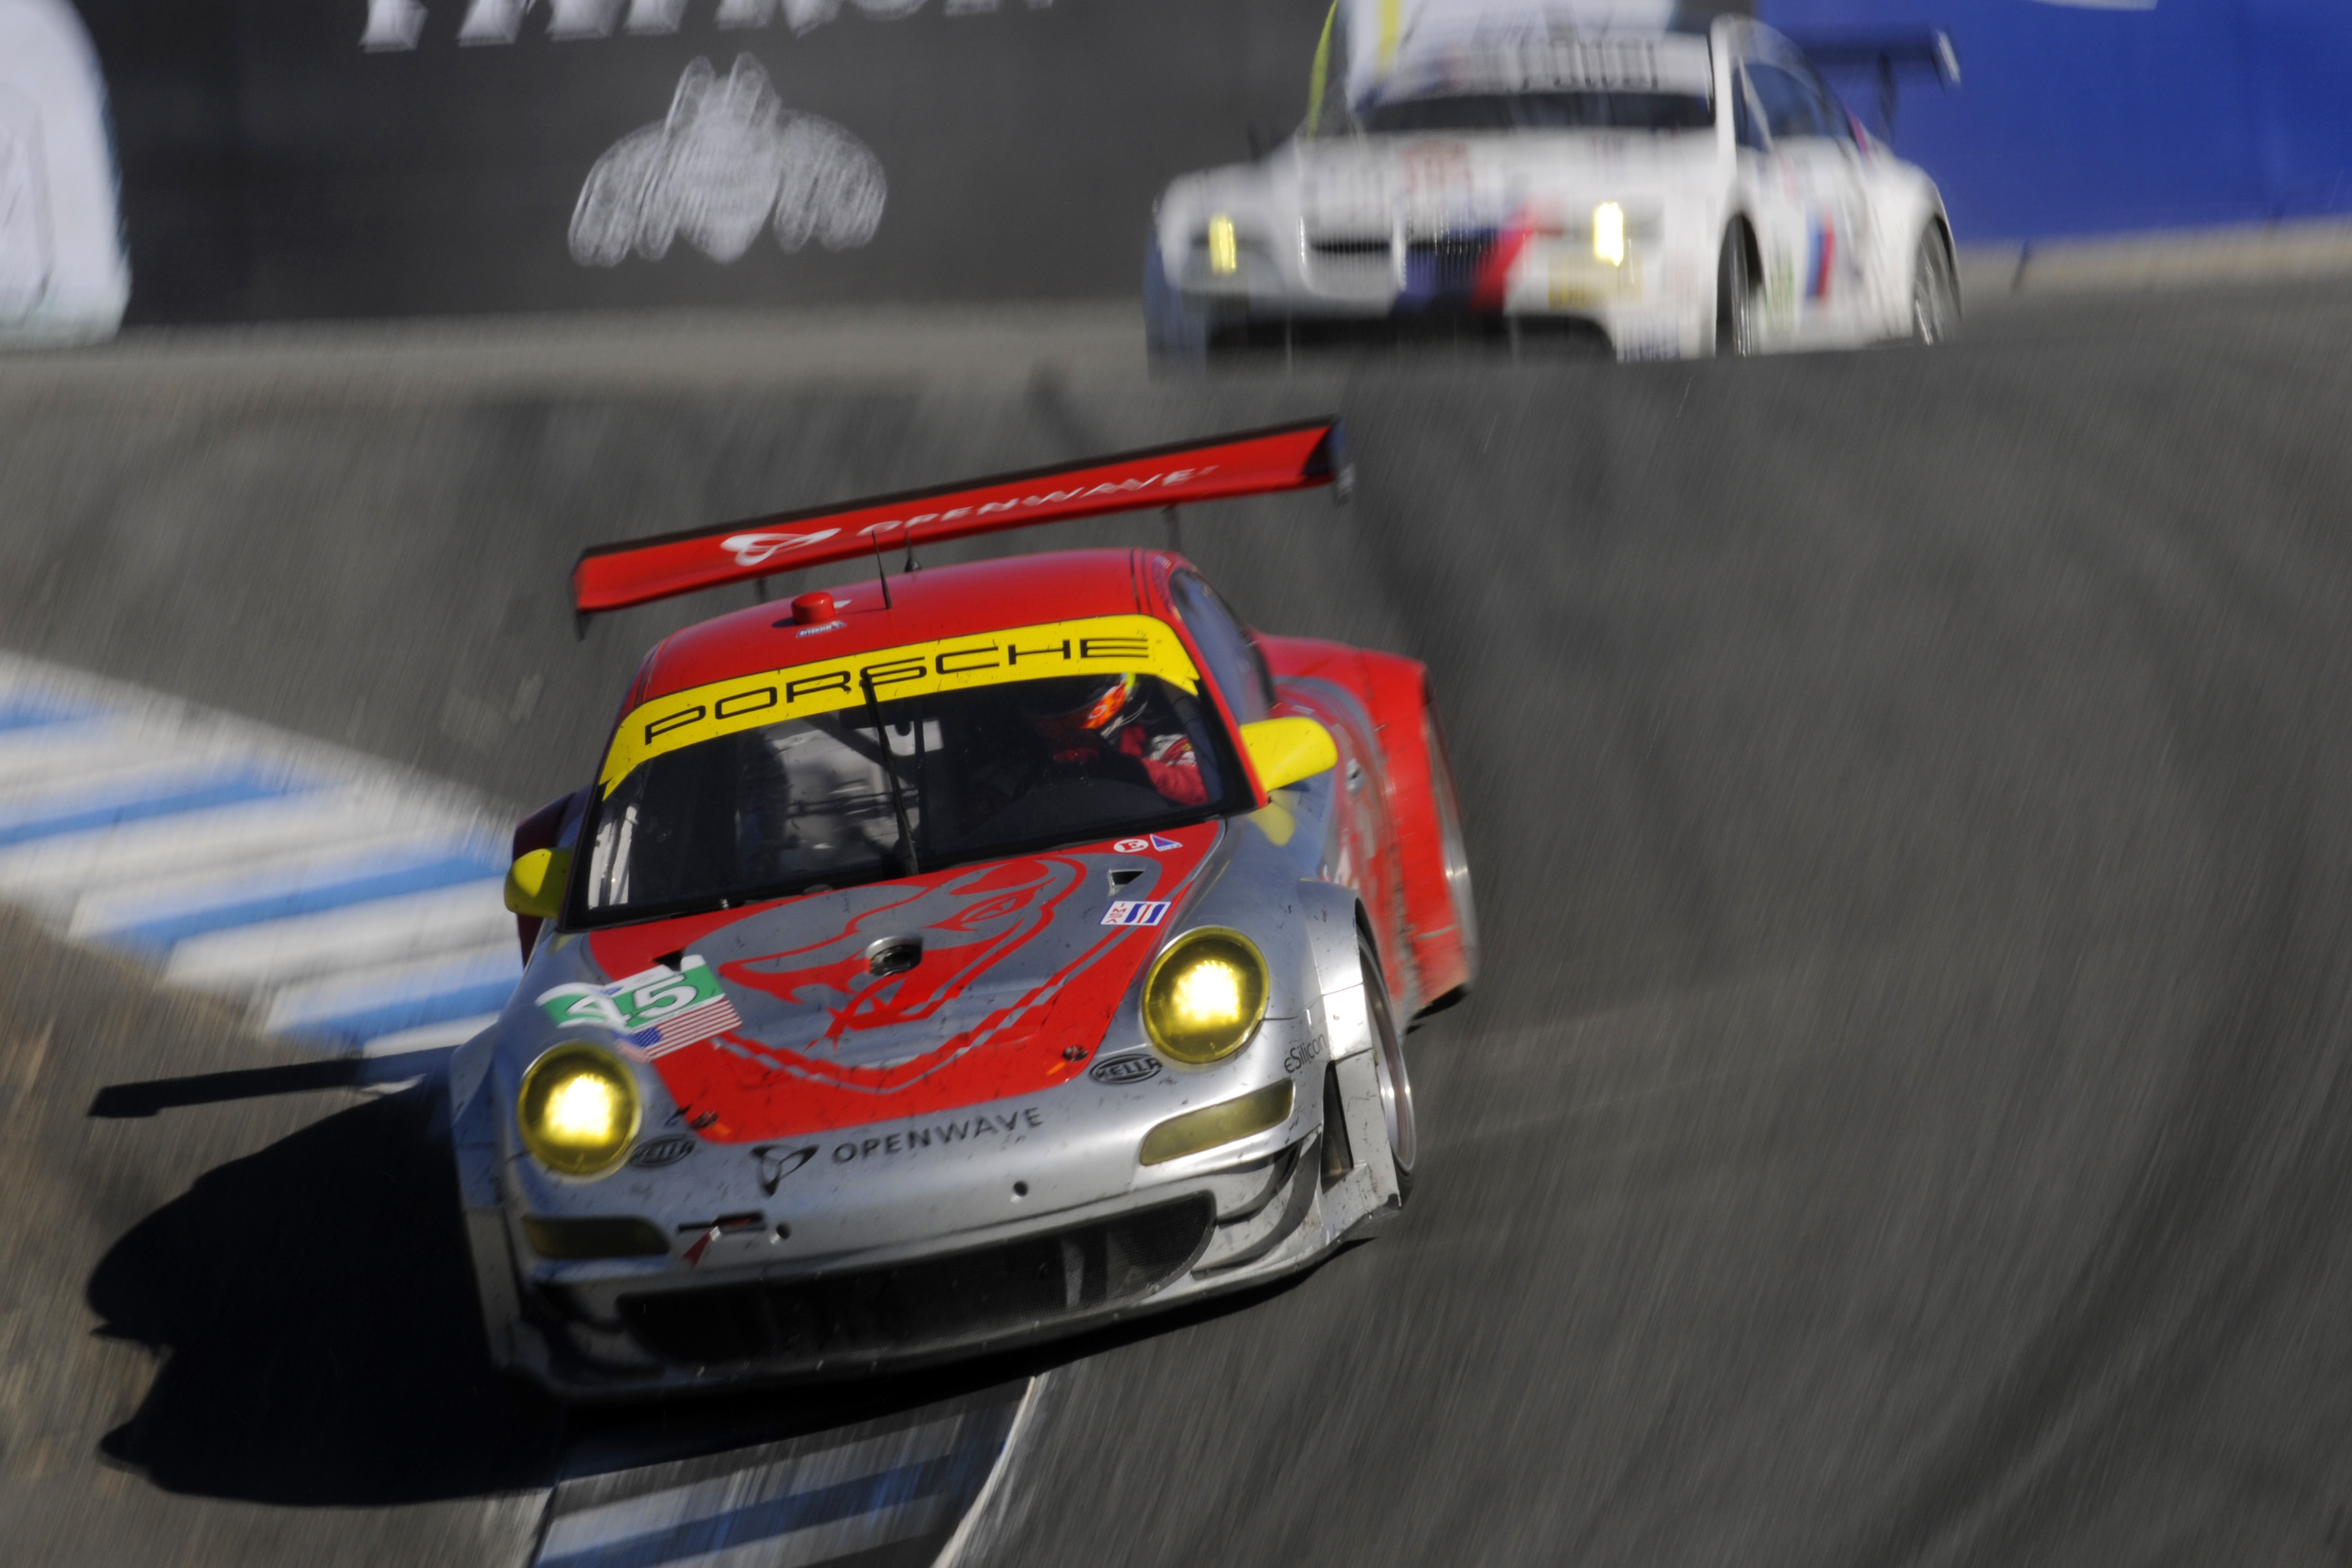 m11_3902_fine Inspiring Porsche 911 Gt1 Road atlanta Cars Trend